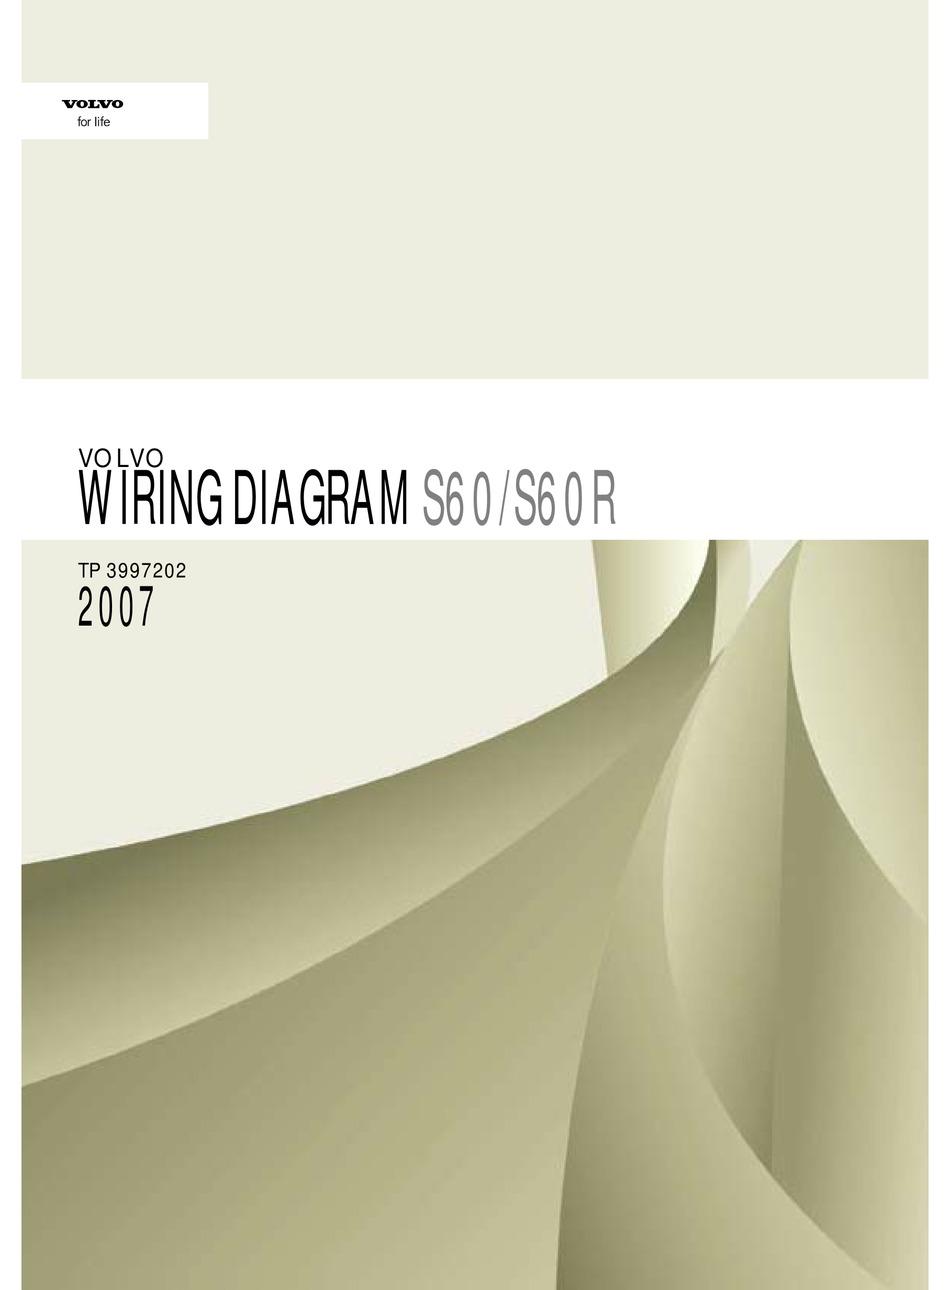 VOLVO S60 WIRING DIAGRAM Pdf Download | ManualsLib | 2007 Volvo S60 Wiring Diagram |  | ManualsLib